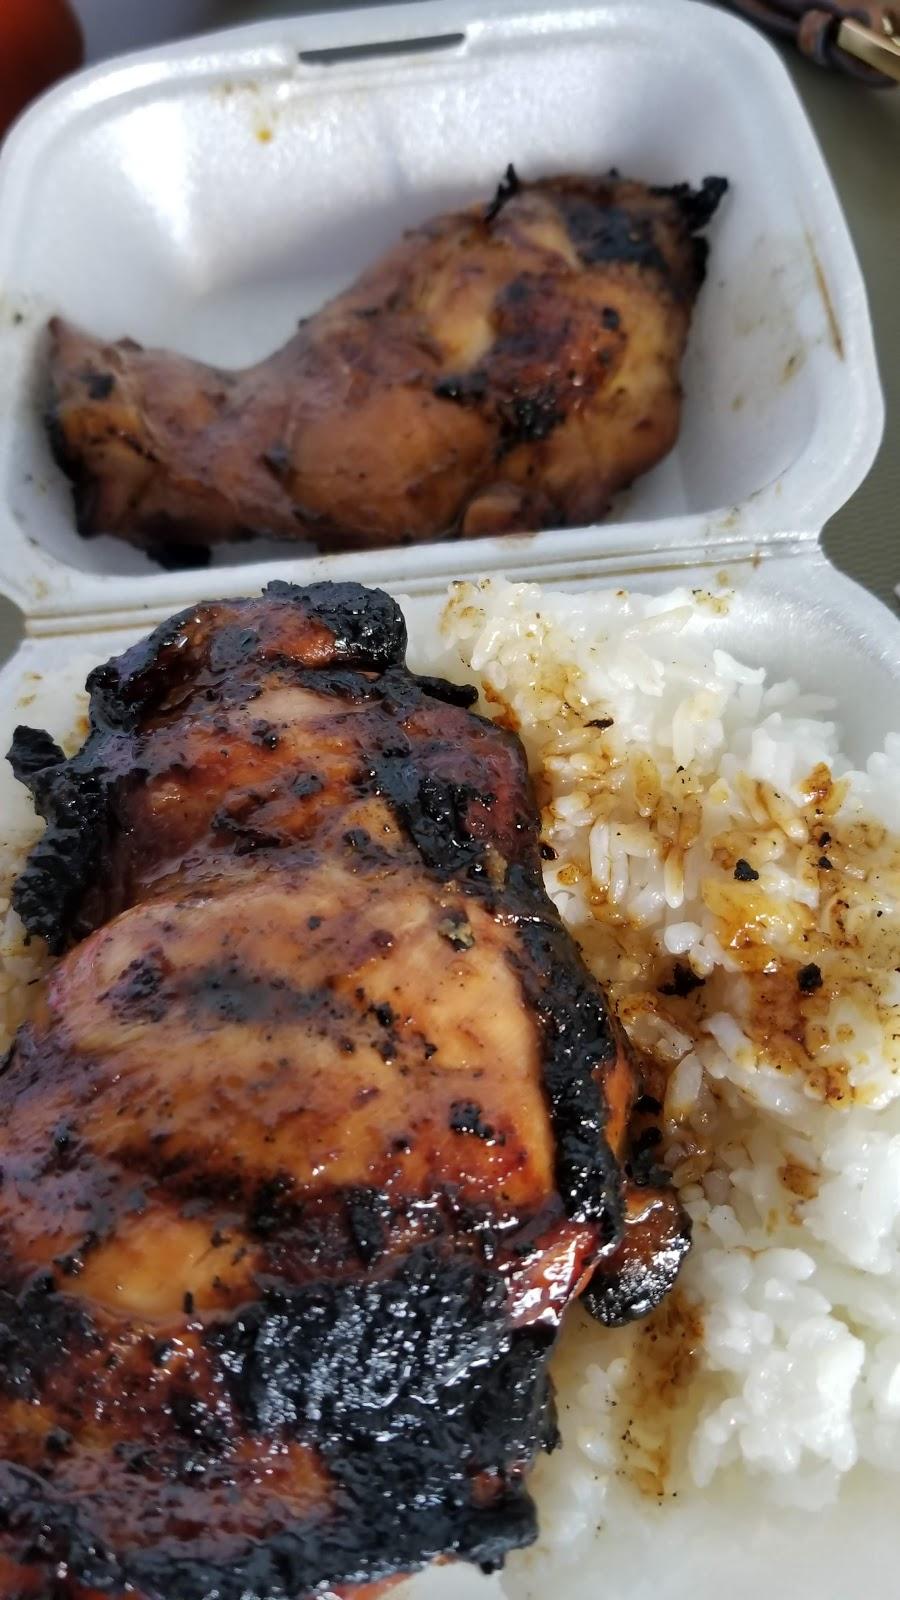 Pinks Grill - restaurant  | Photo 9 of 10 | Address: 662 Parker Rd, Fairfield, CA 94533, USA | Phone: (707) 386-3954